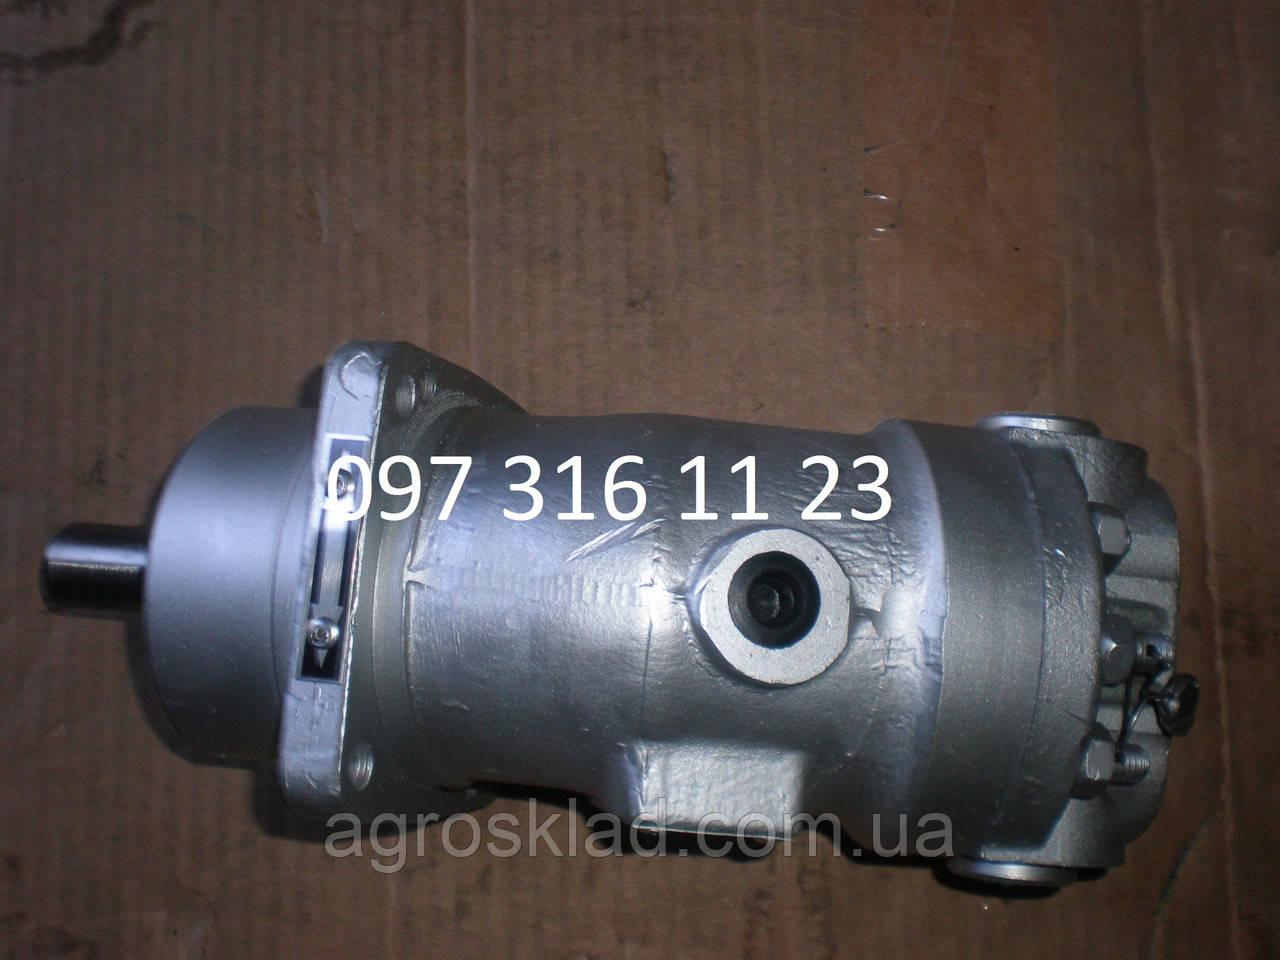 Гидромоторы 210.12.00